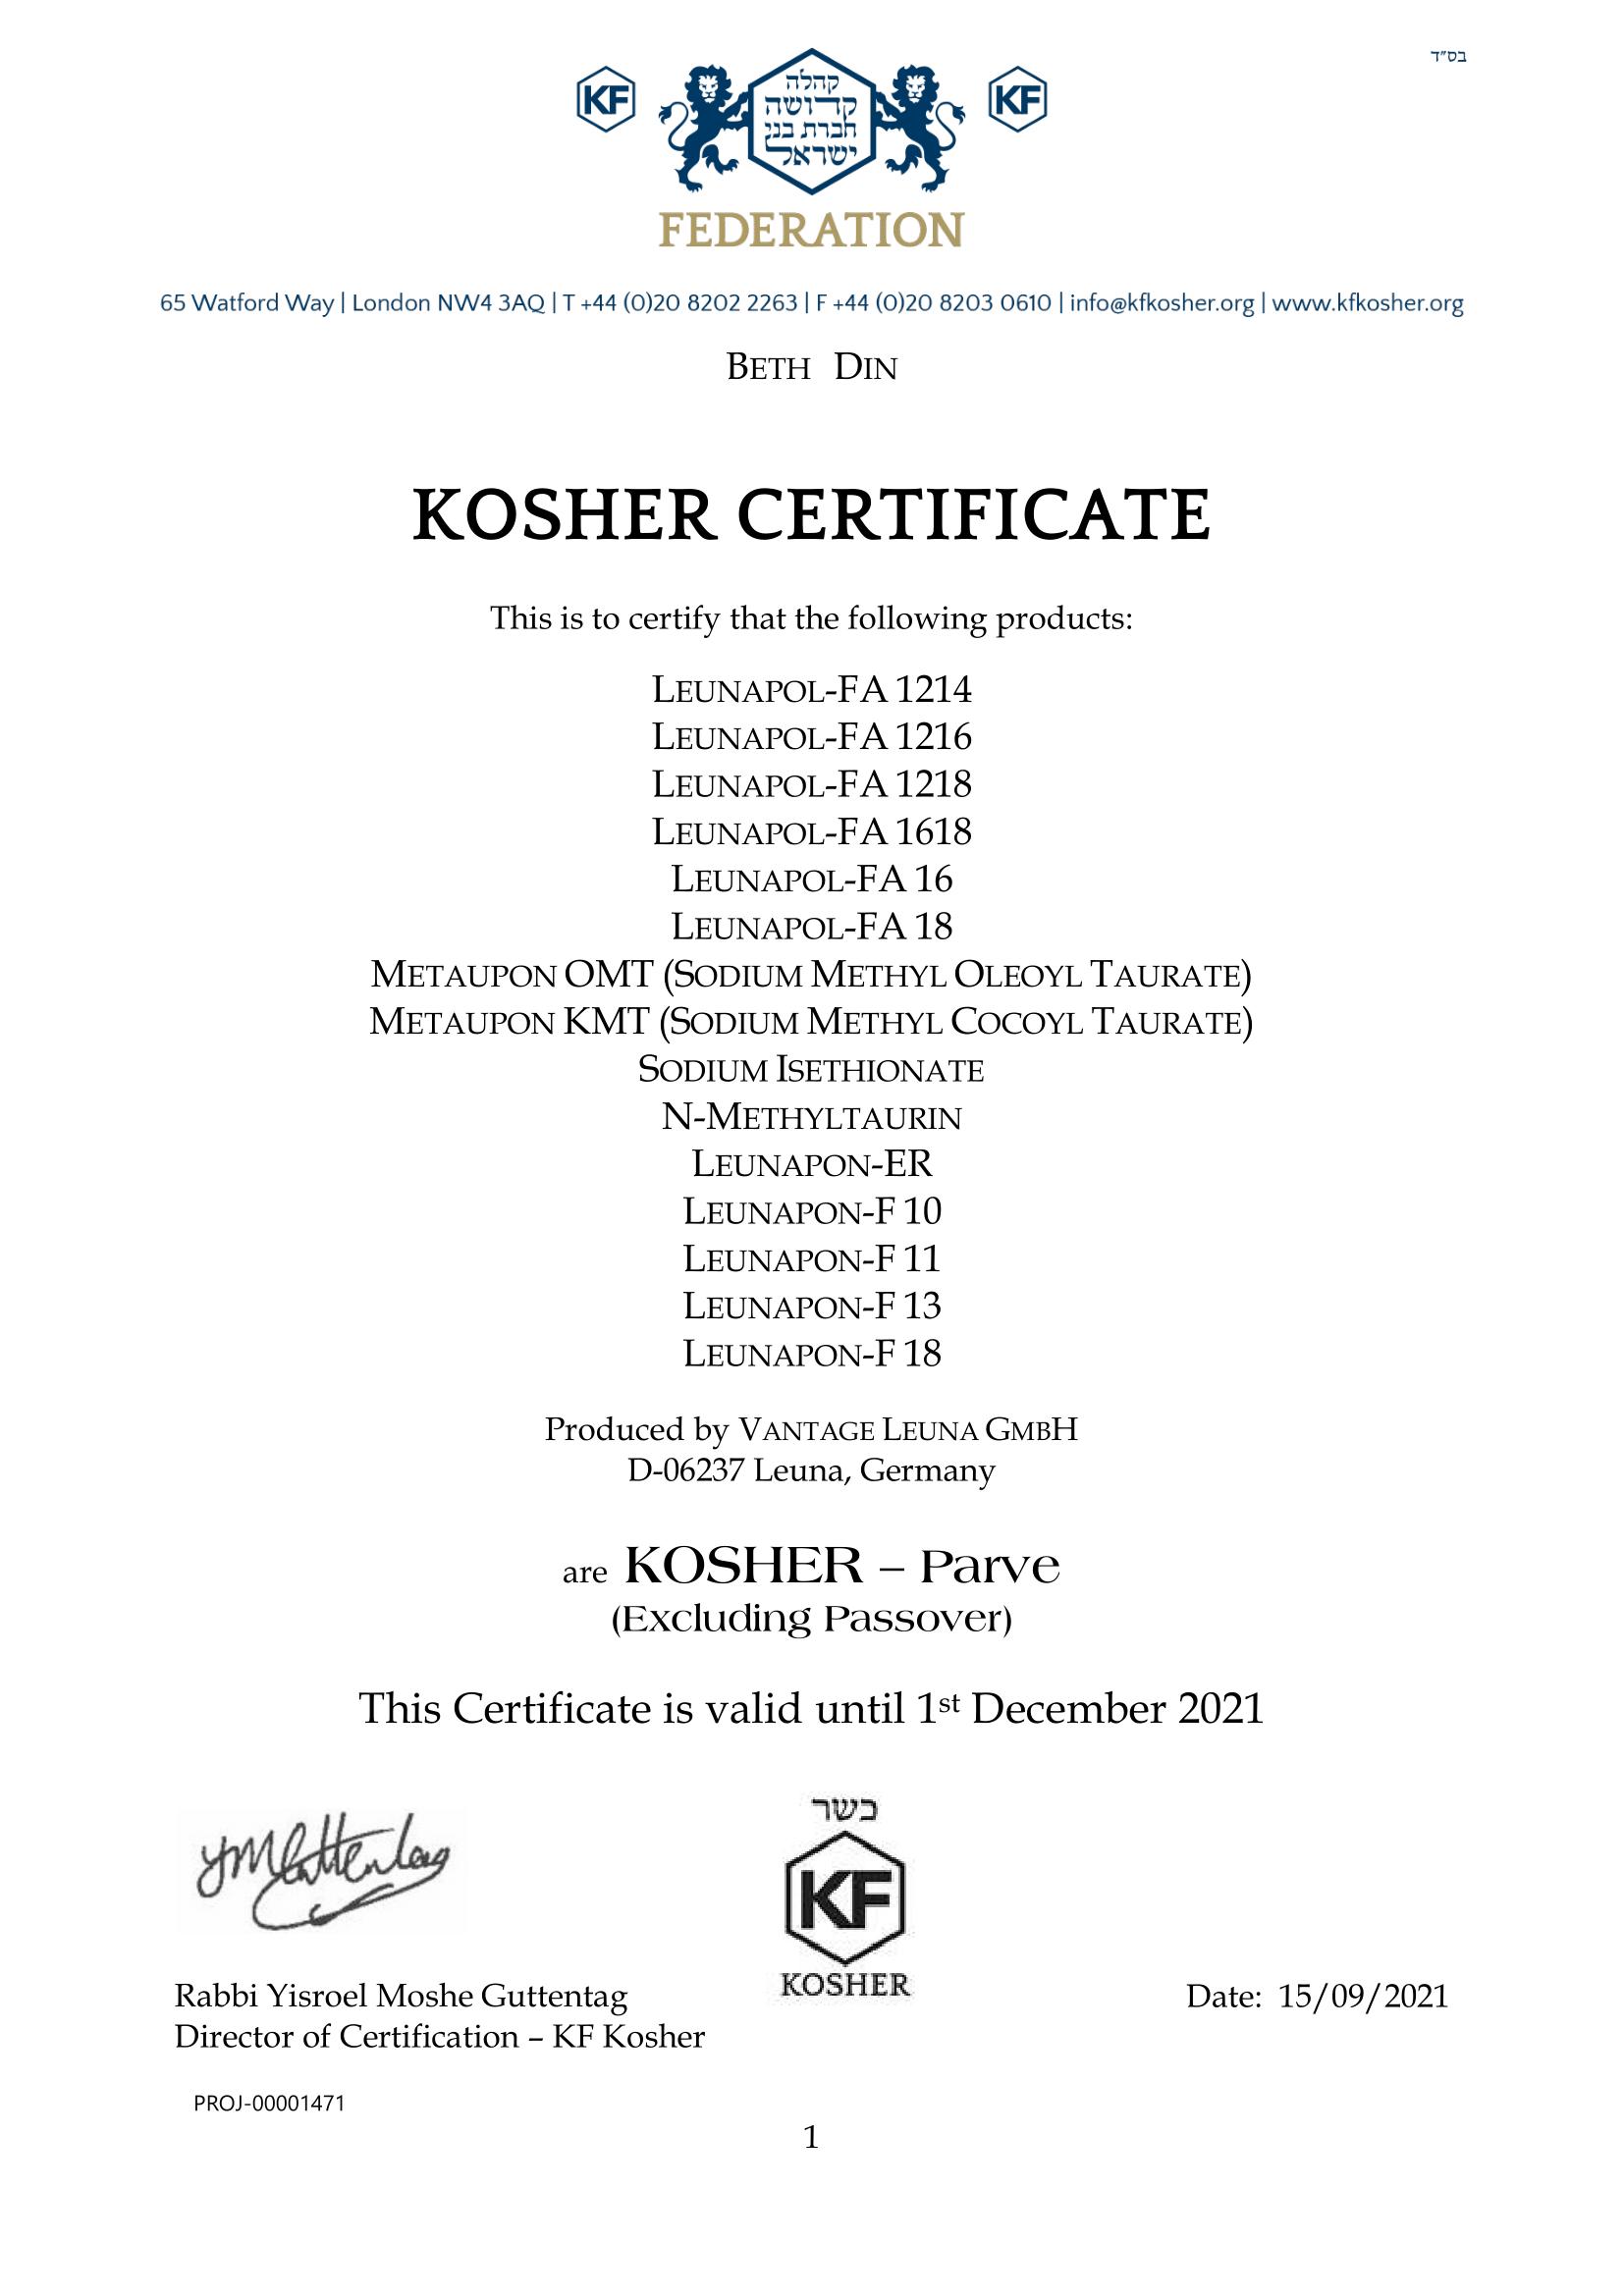 Certificate - Vantage Leuna temp till Dec 21-1